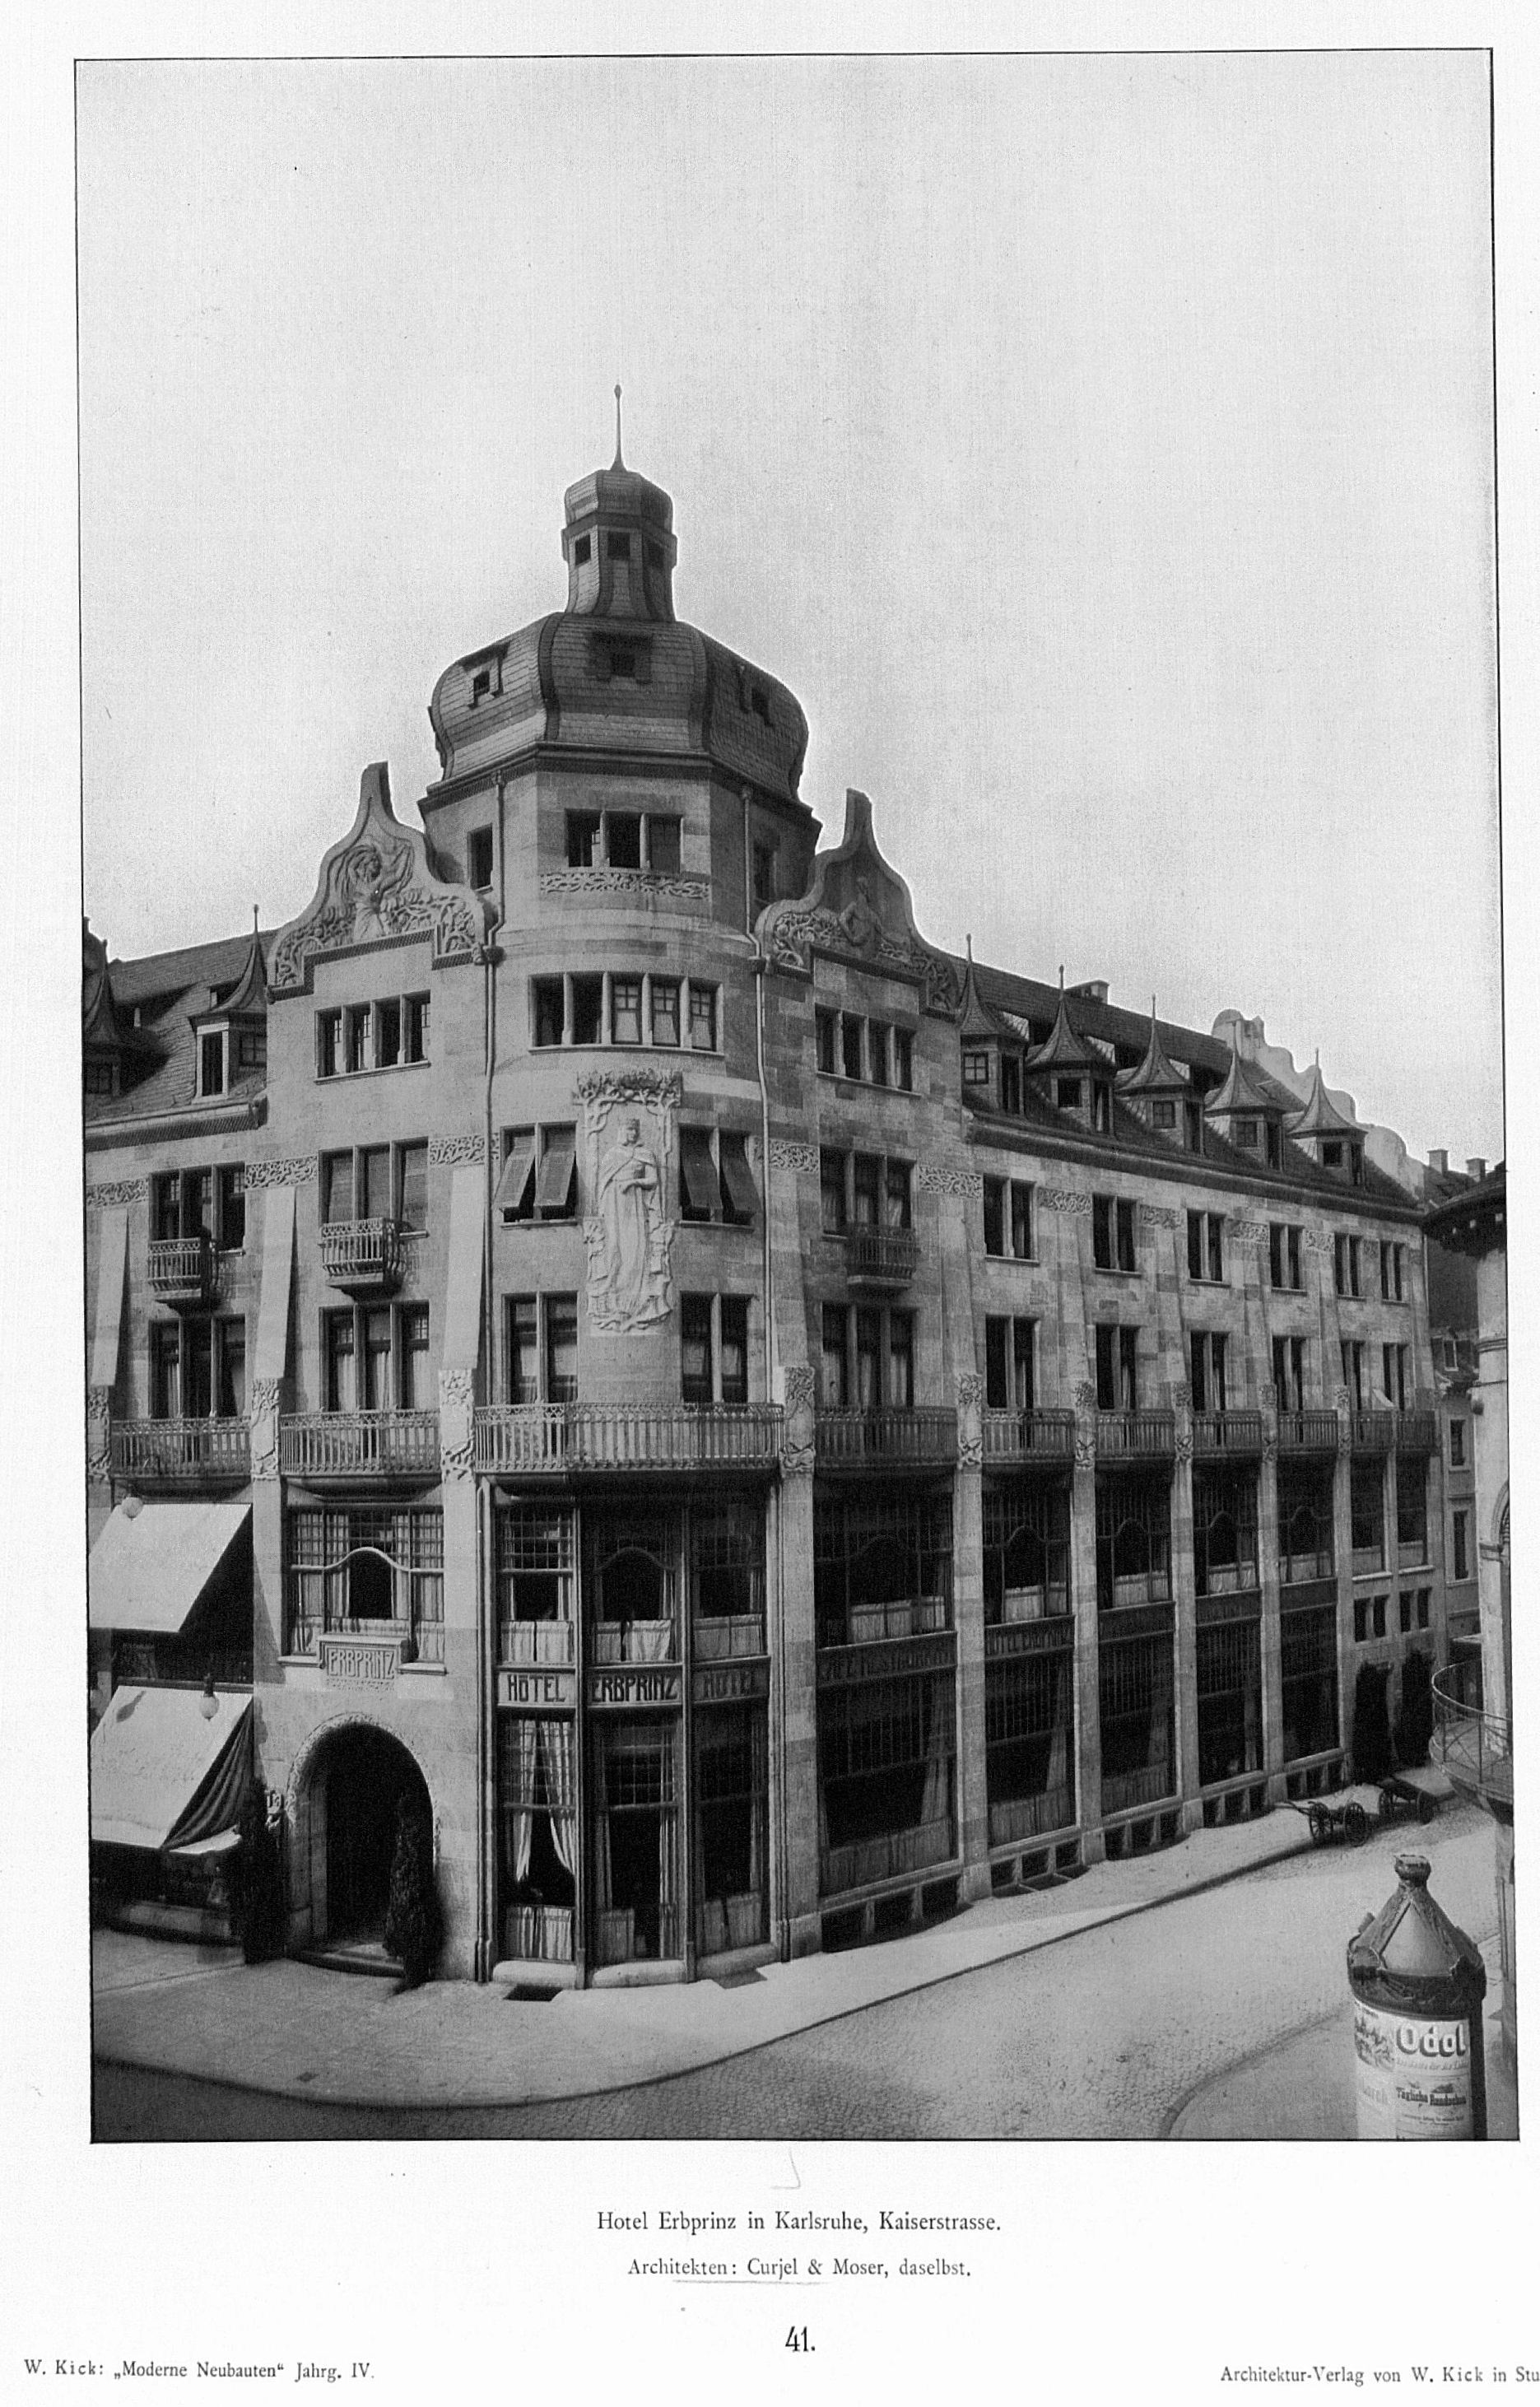 Architekten Karlsruhe file hotel erbprinz in karlsruhe kaiserstrasse architekten curjel